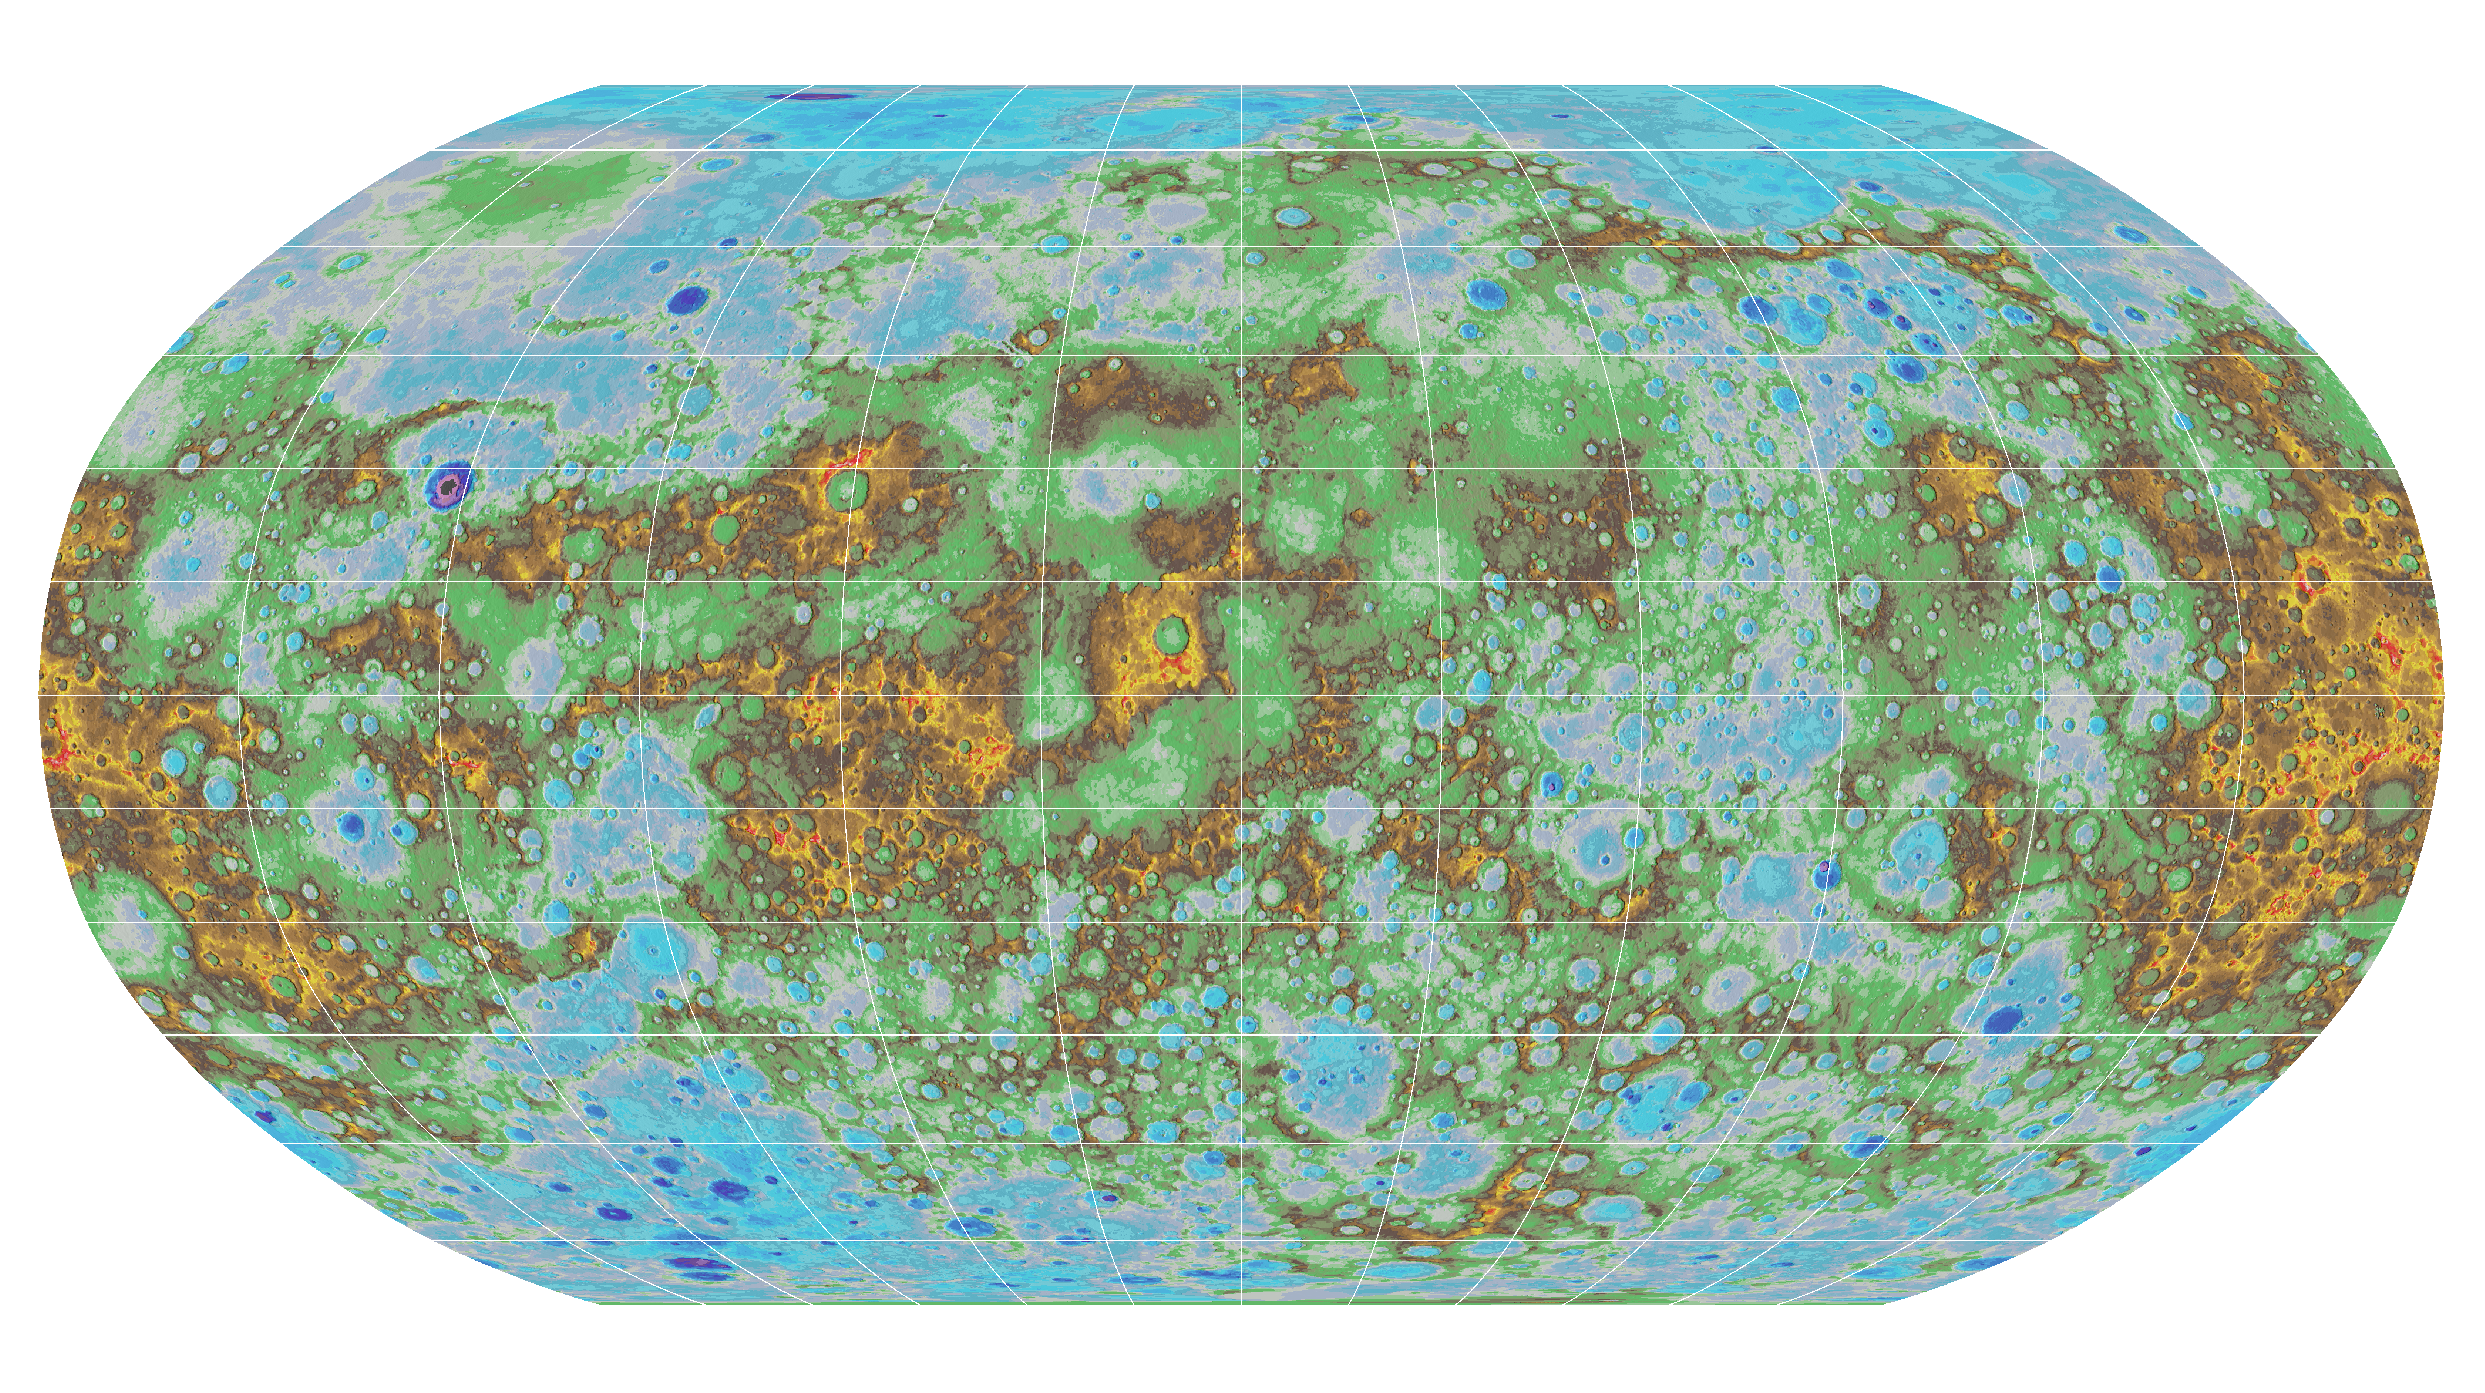 Mercury MESSENGER Global Colorized Shade Km USGS Astrogeology - Us geological survey map legend